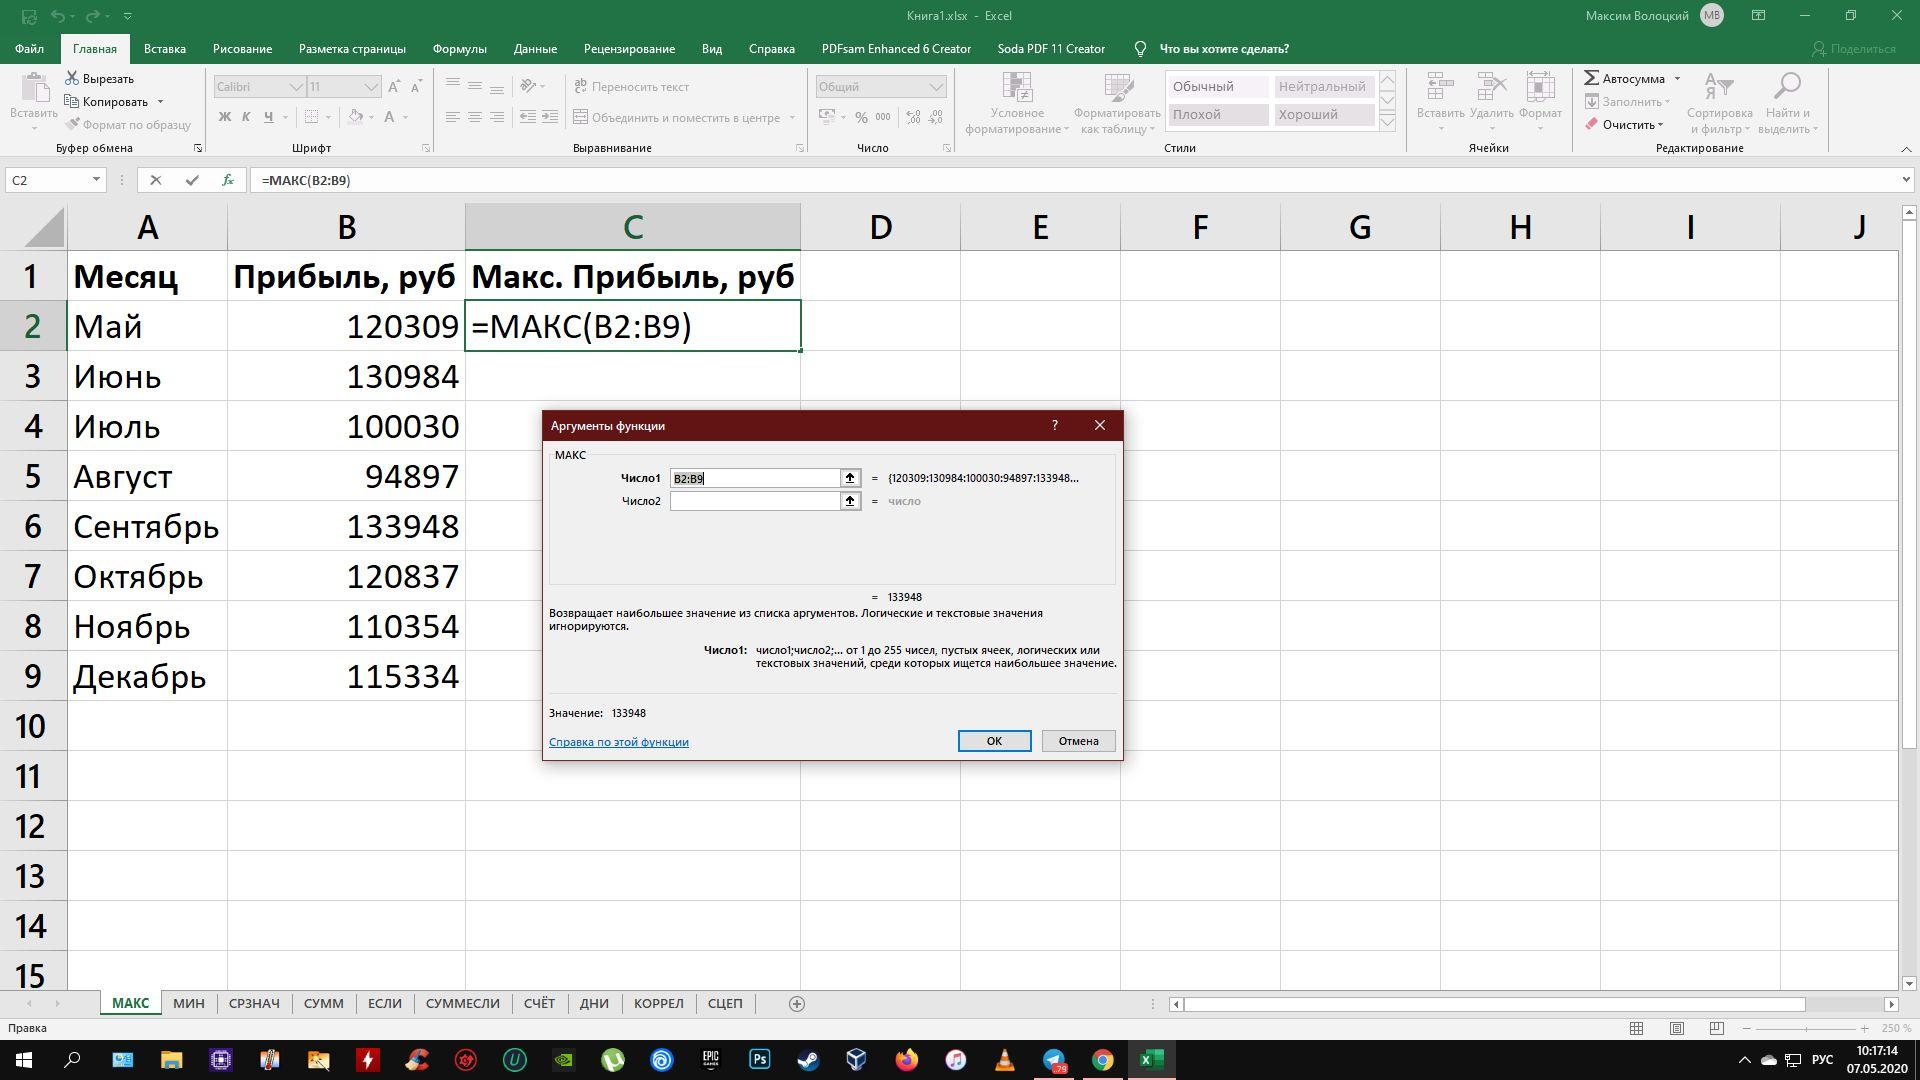 10 formul v excel yak polegshat vam zhittya 1 - 10 формул в Excel, які полегшать вам життя